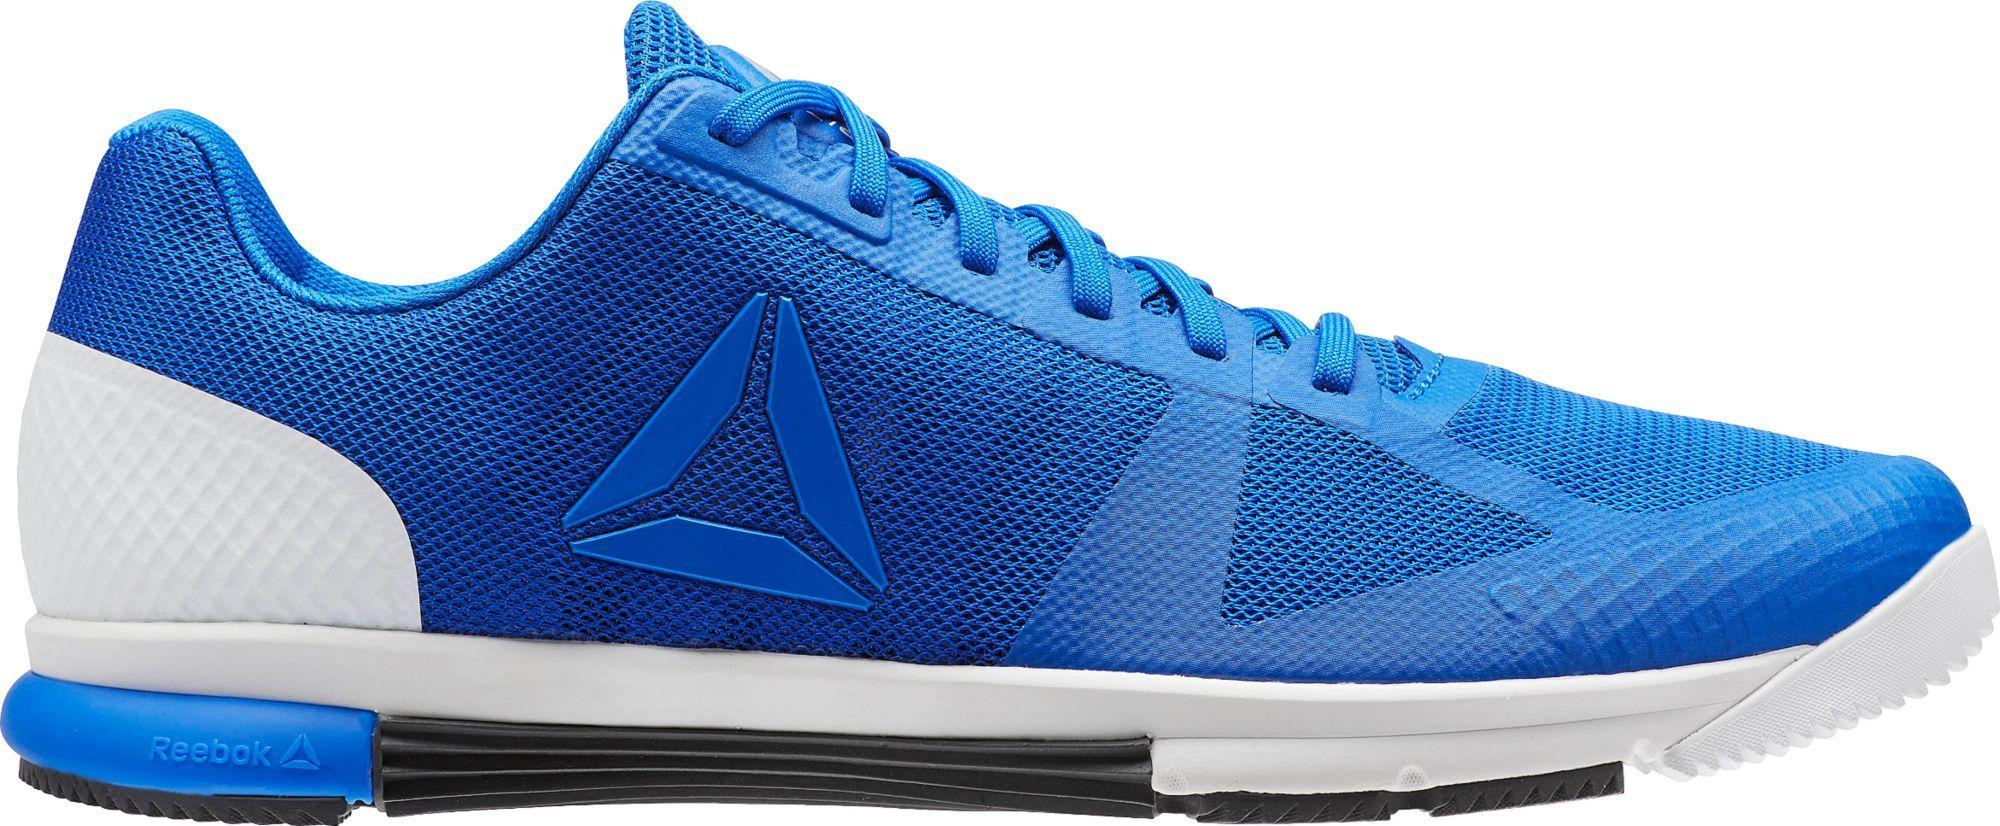 9430501b2558f8 Reebok Men s CrossFit Speed TR 2.0 Training Shoes